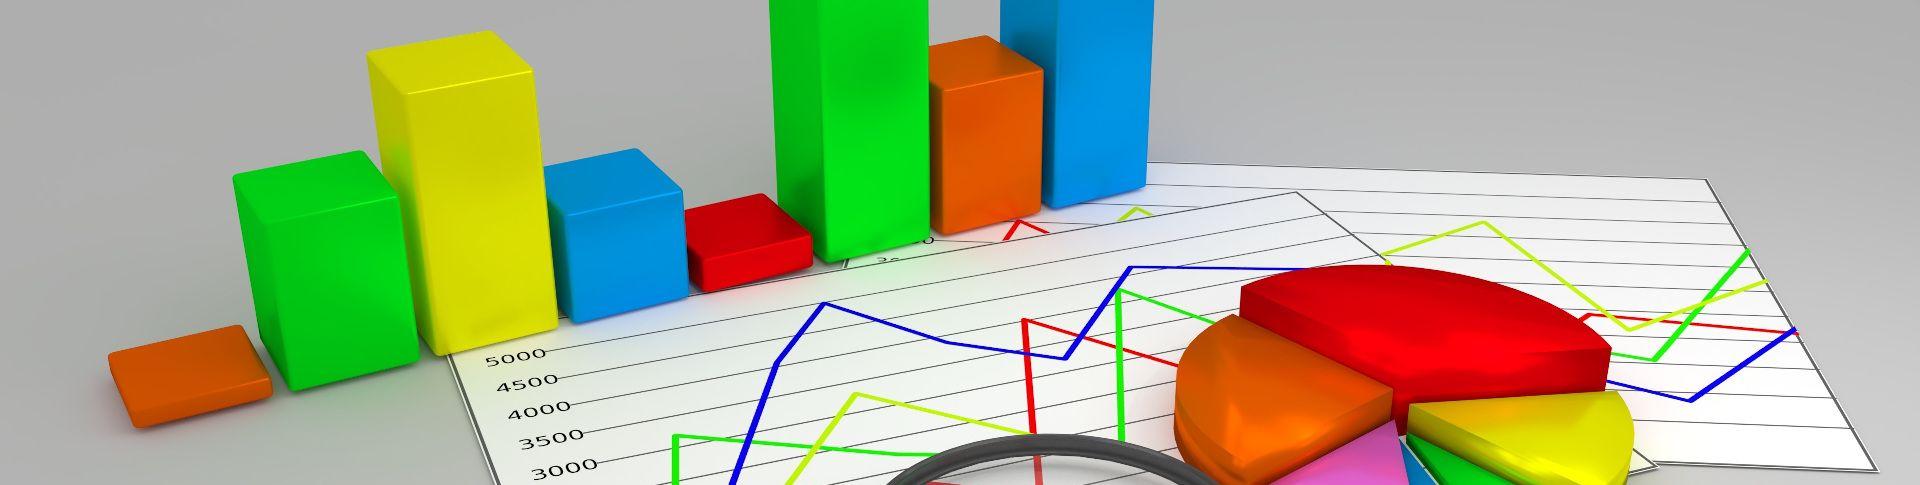 Statistiken - Staatsangehöirgkeiten